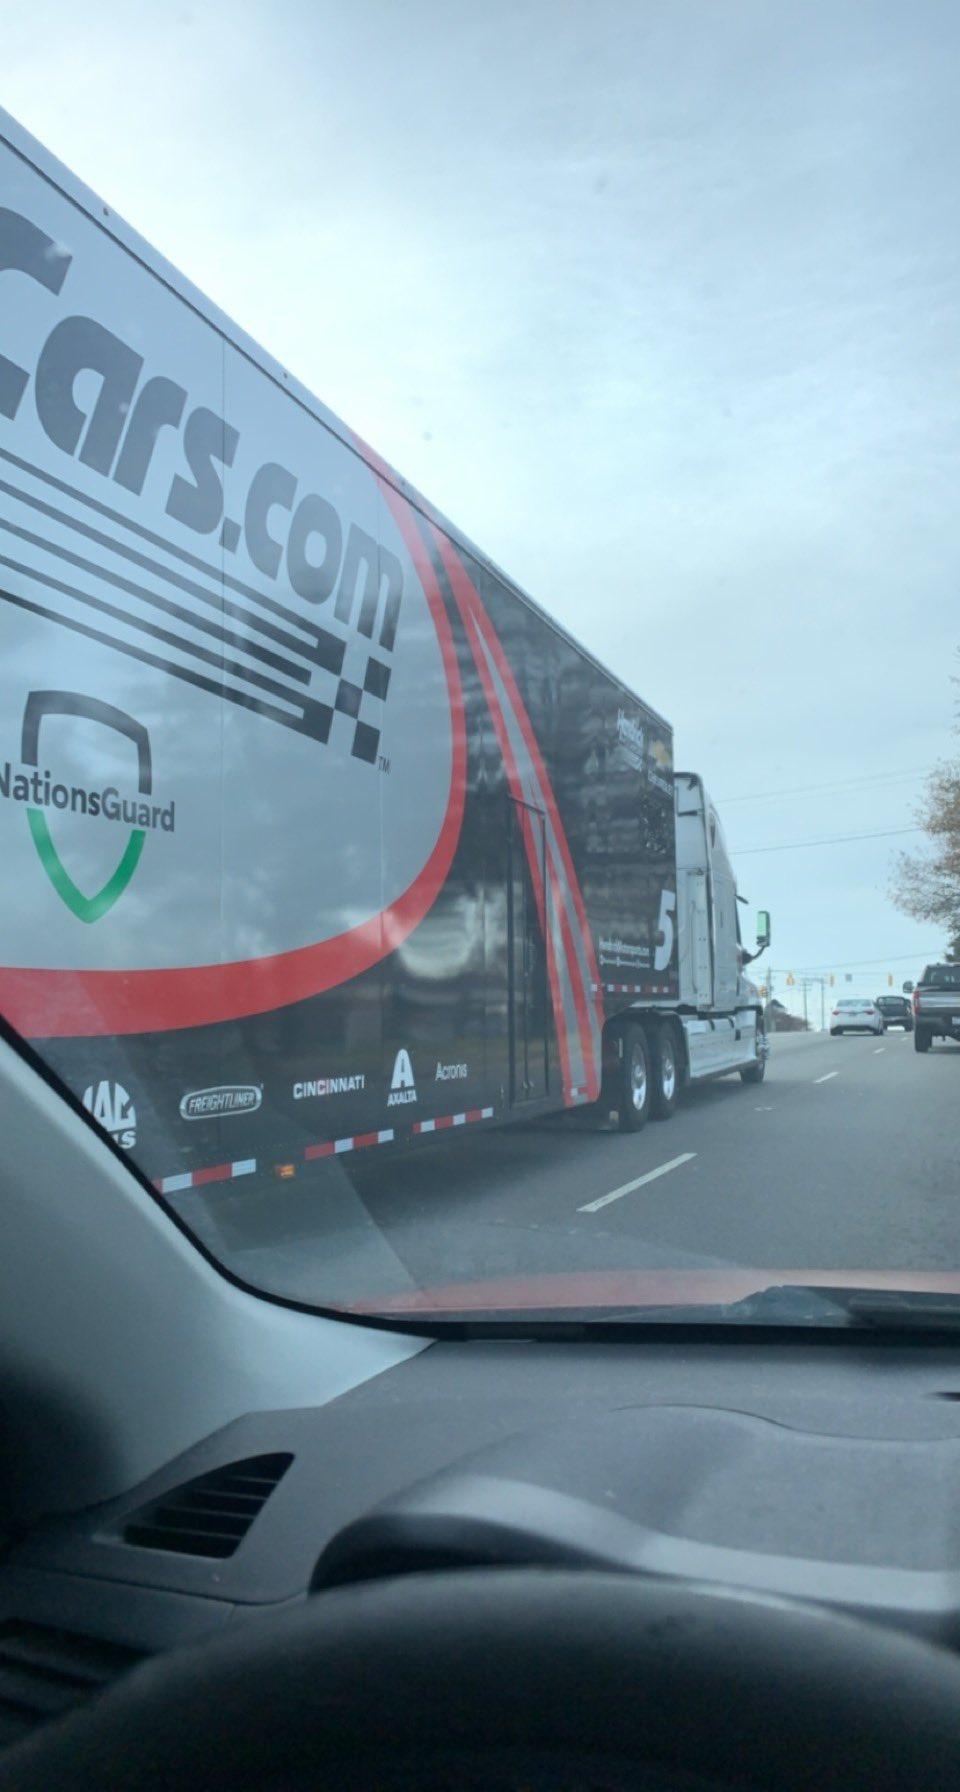 2021 NASCAR hauler for Kyle Larson at Hendrick Motorsports